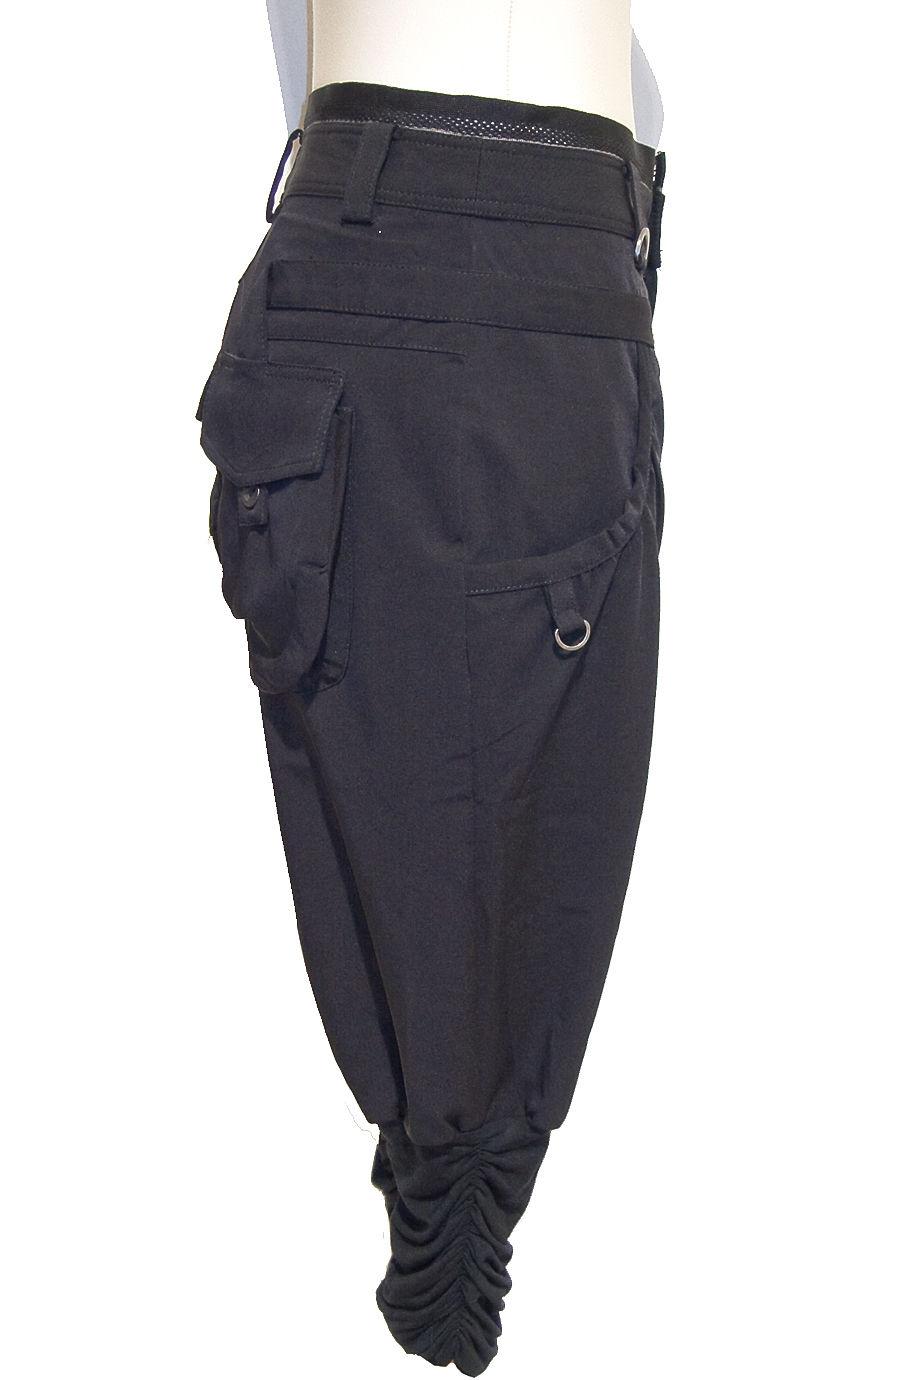 Cargo Cropped Pants Black